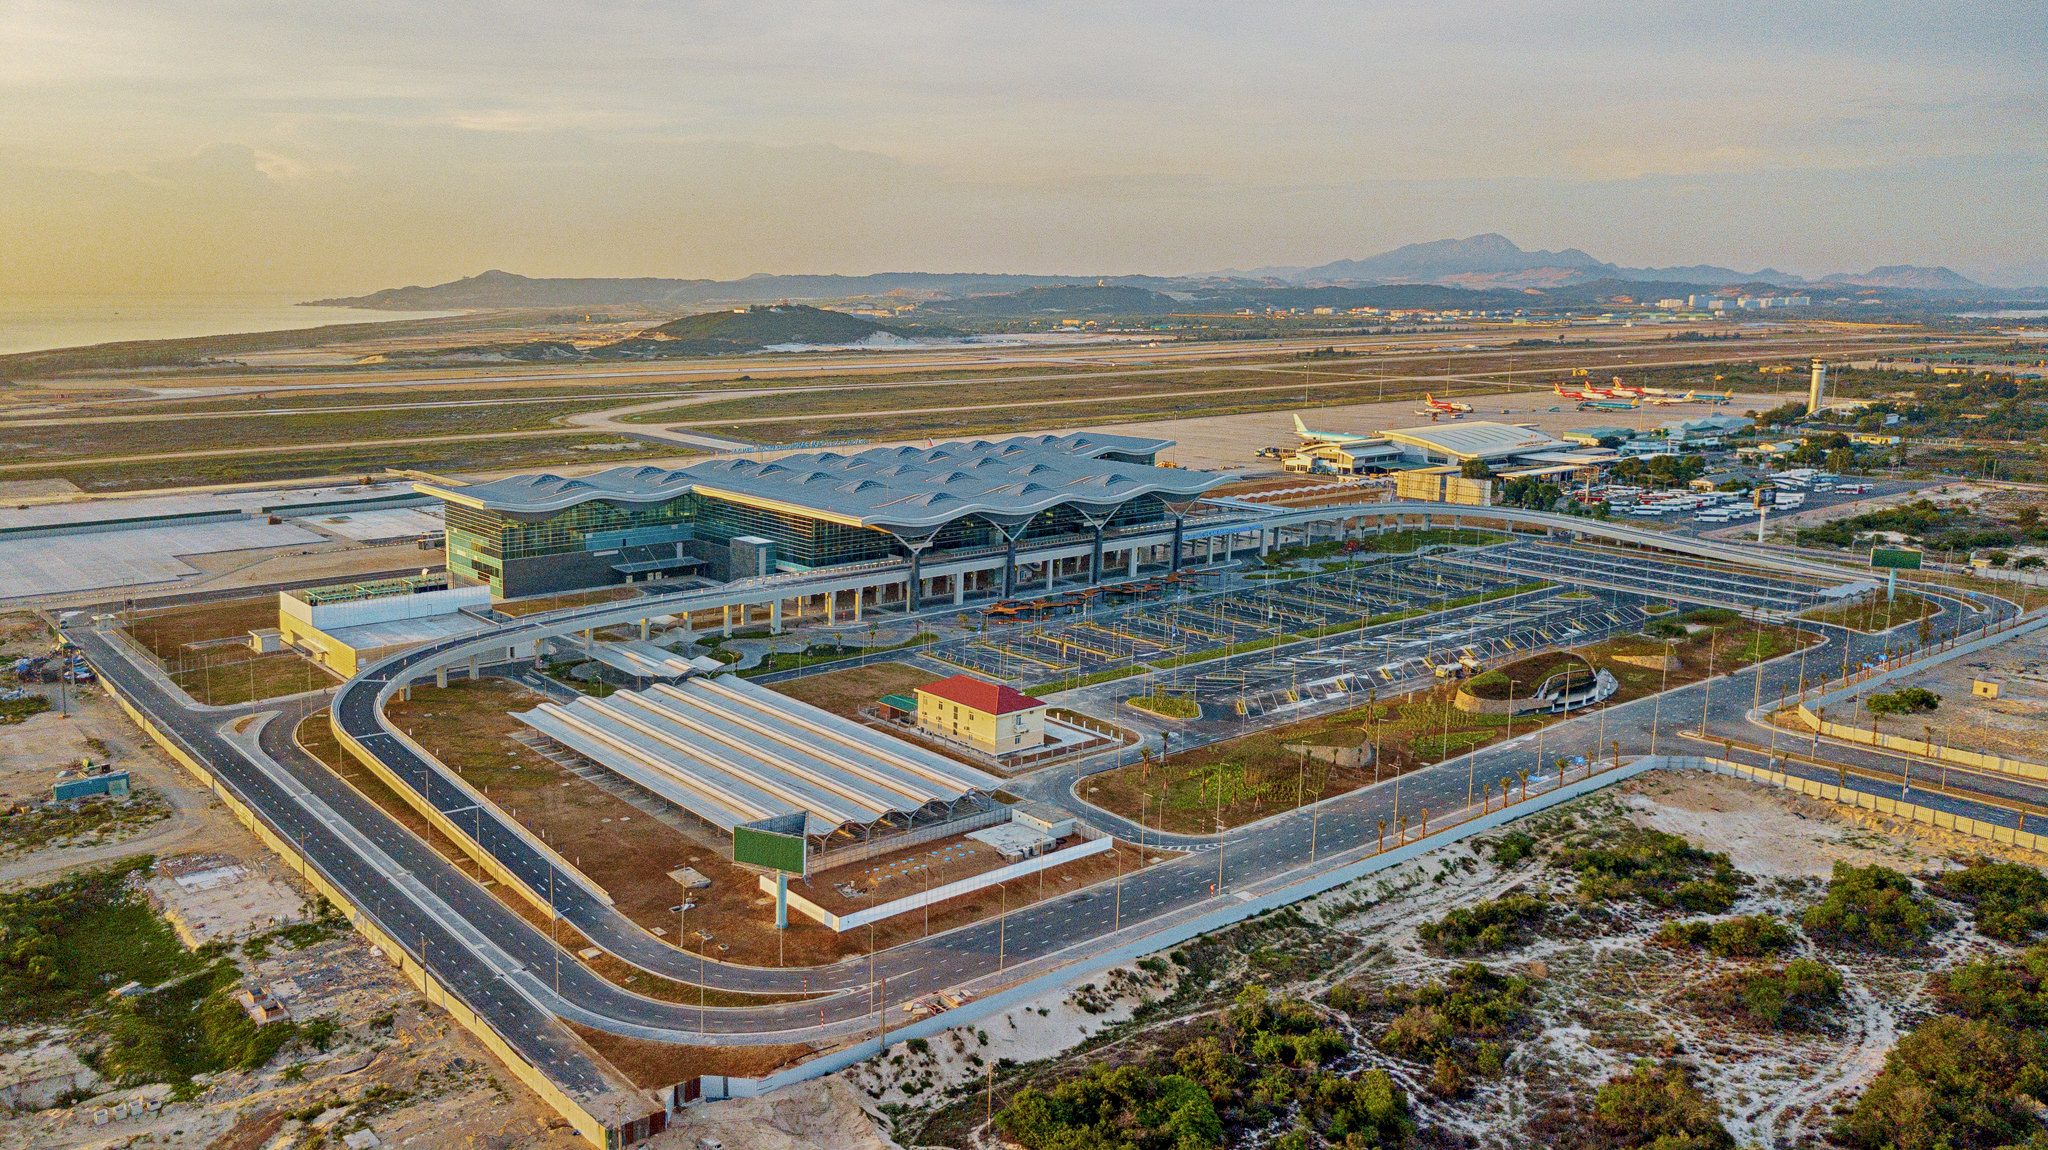 20180626 - Cam Ranh Airport - Architecture - Flycam - 0011.jpg